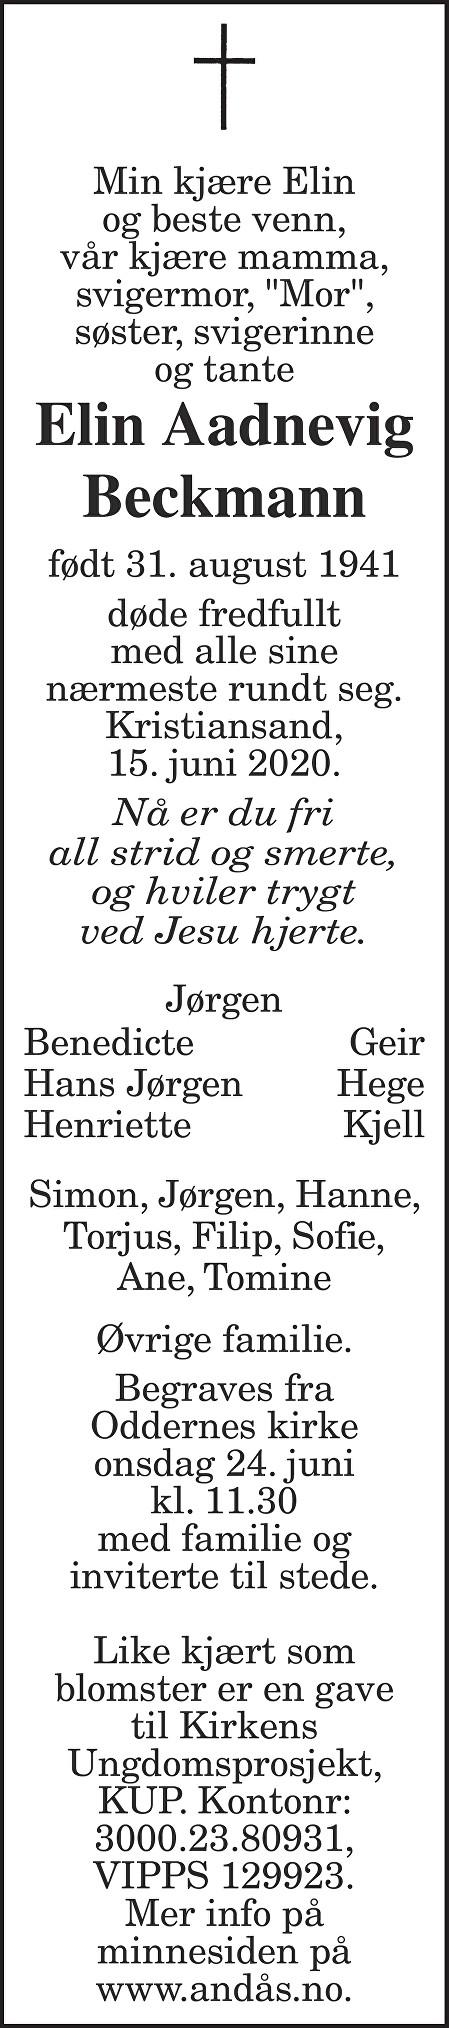 Elin Aadnevig Beckmann Dødsannonse